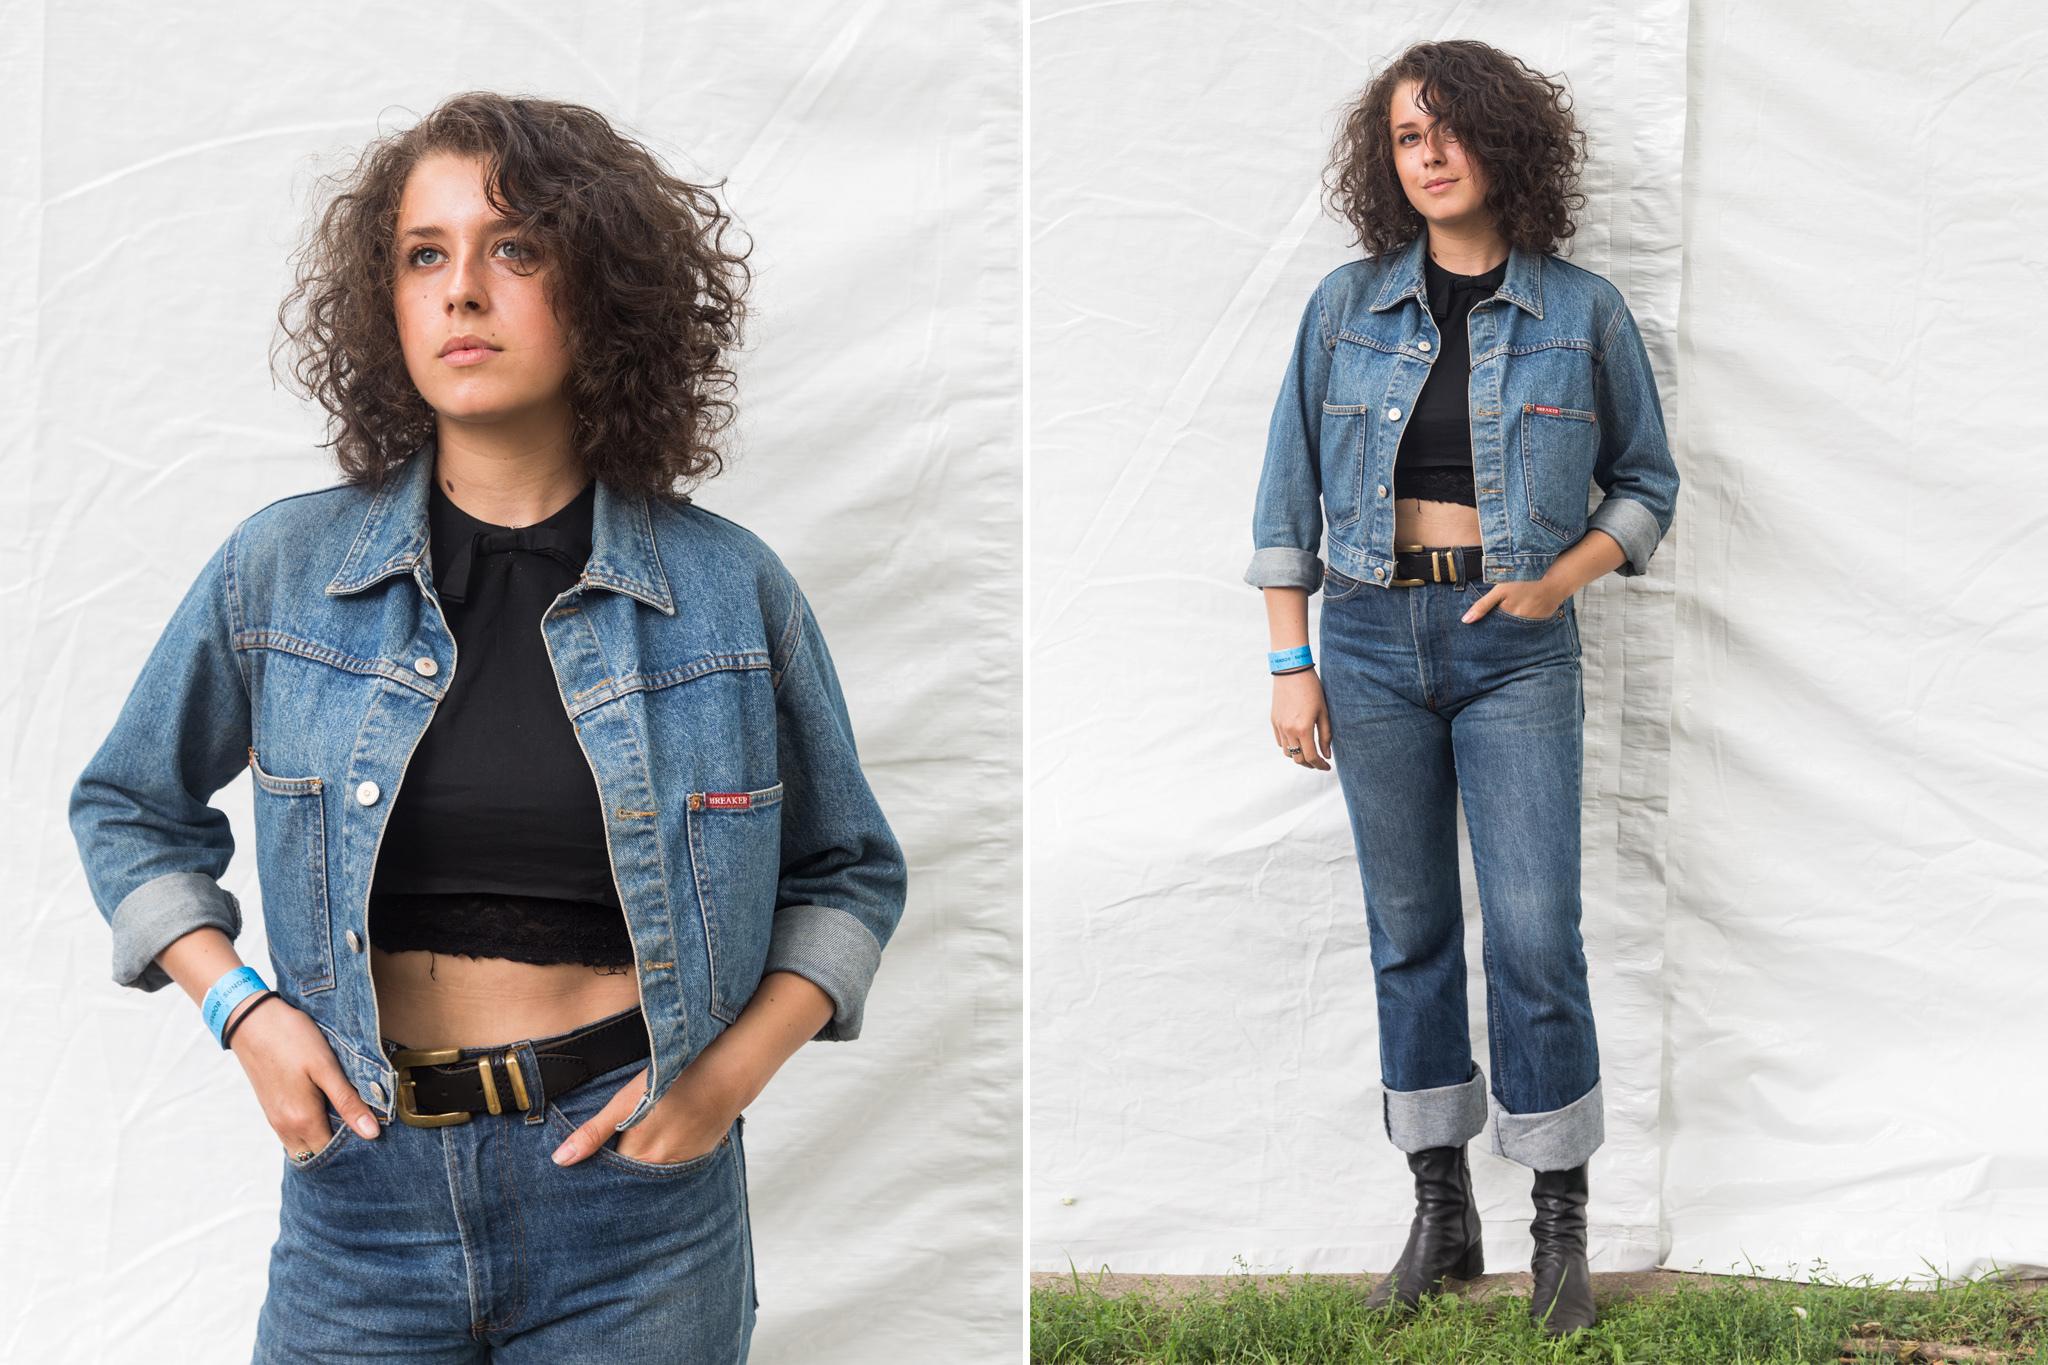 Pitchfork music festival 2017, fashions, jaclyn rivas